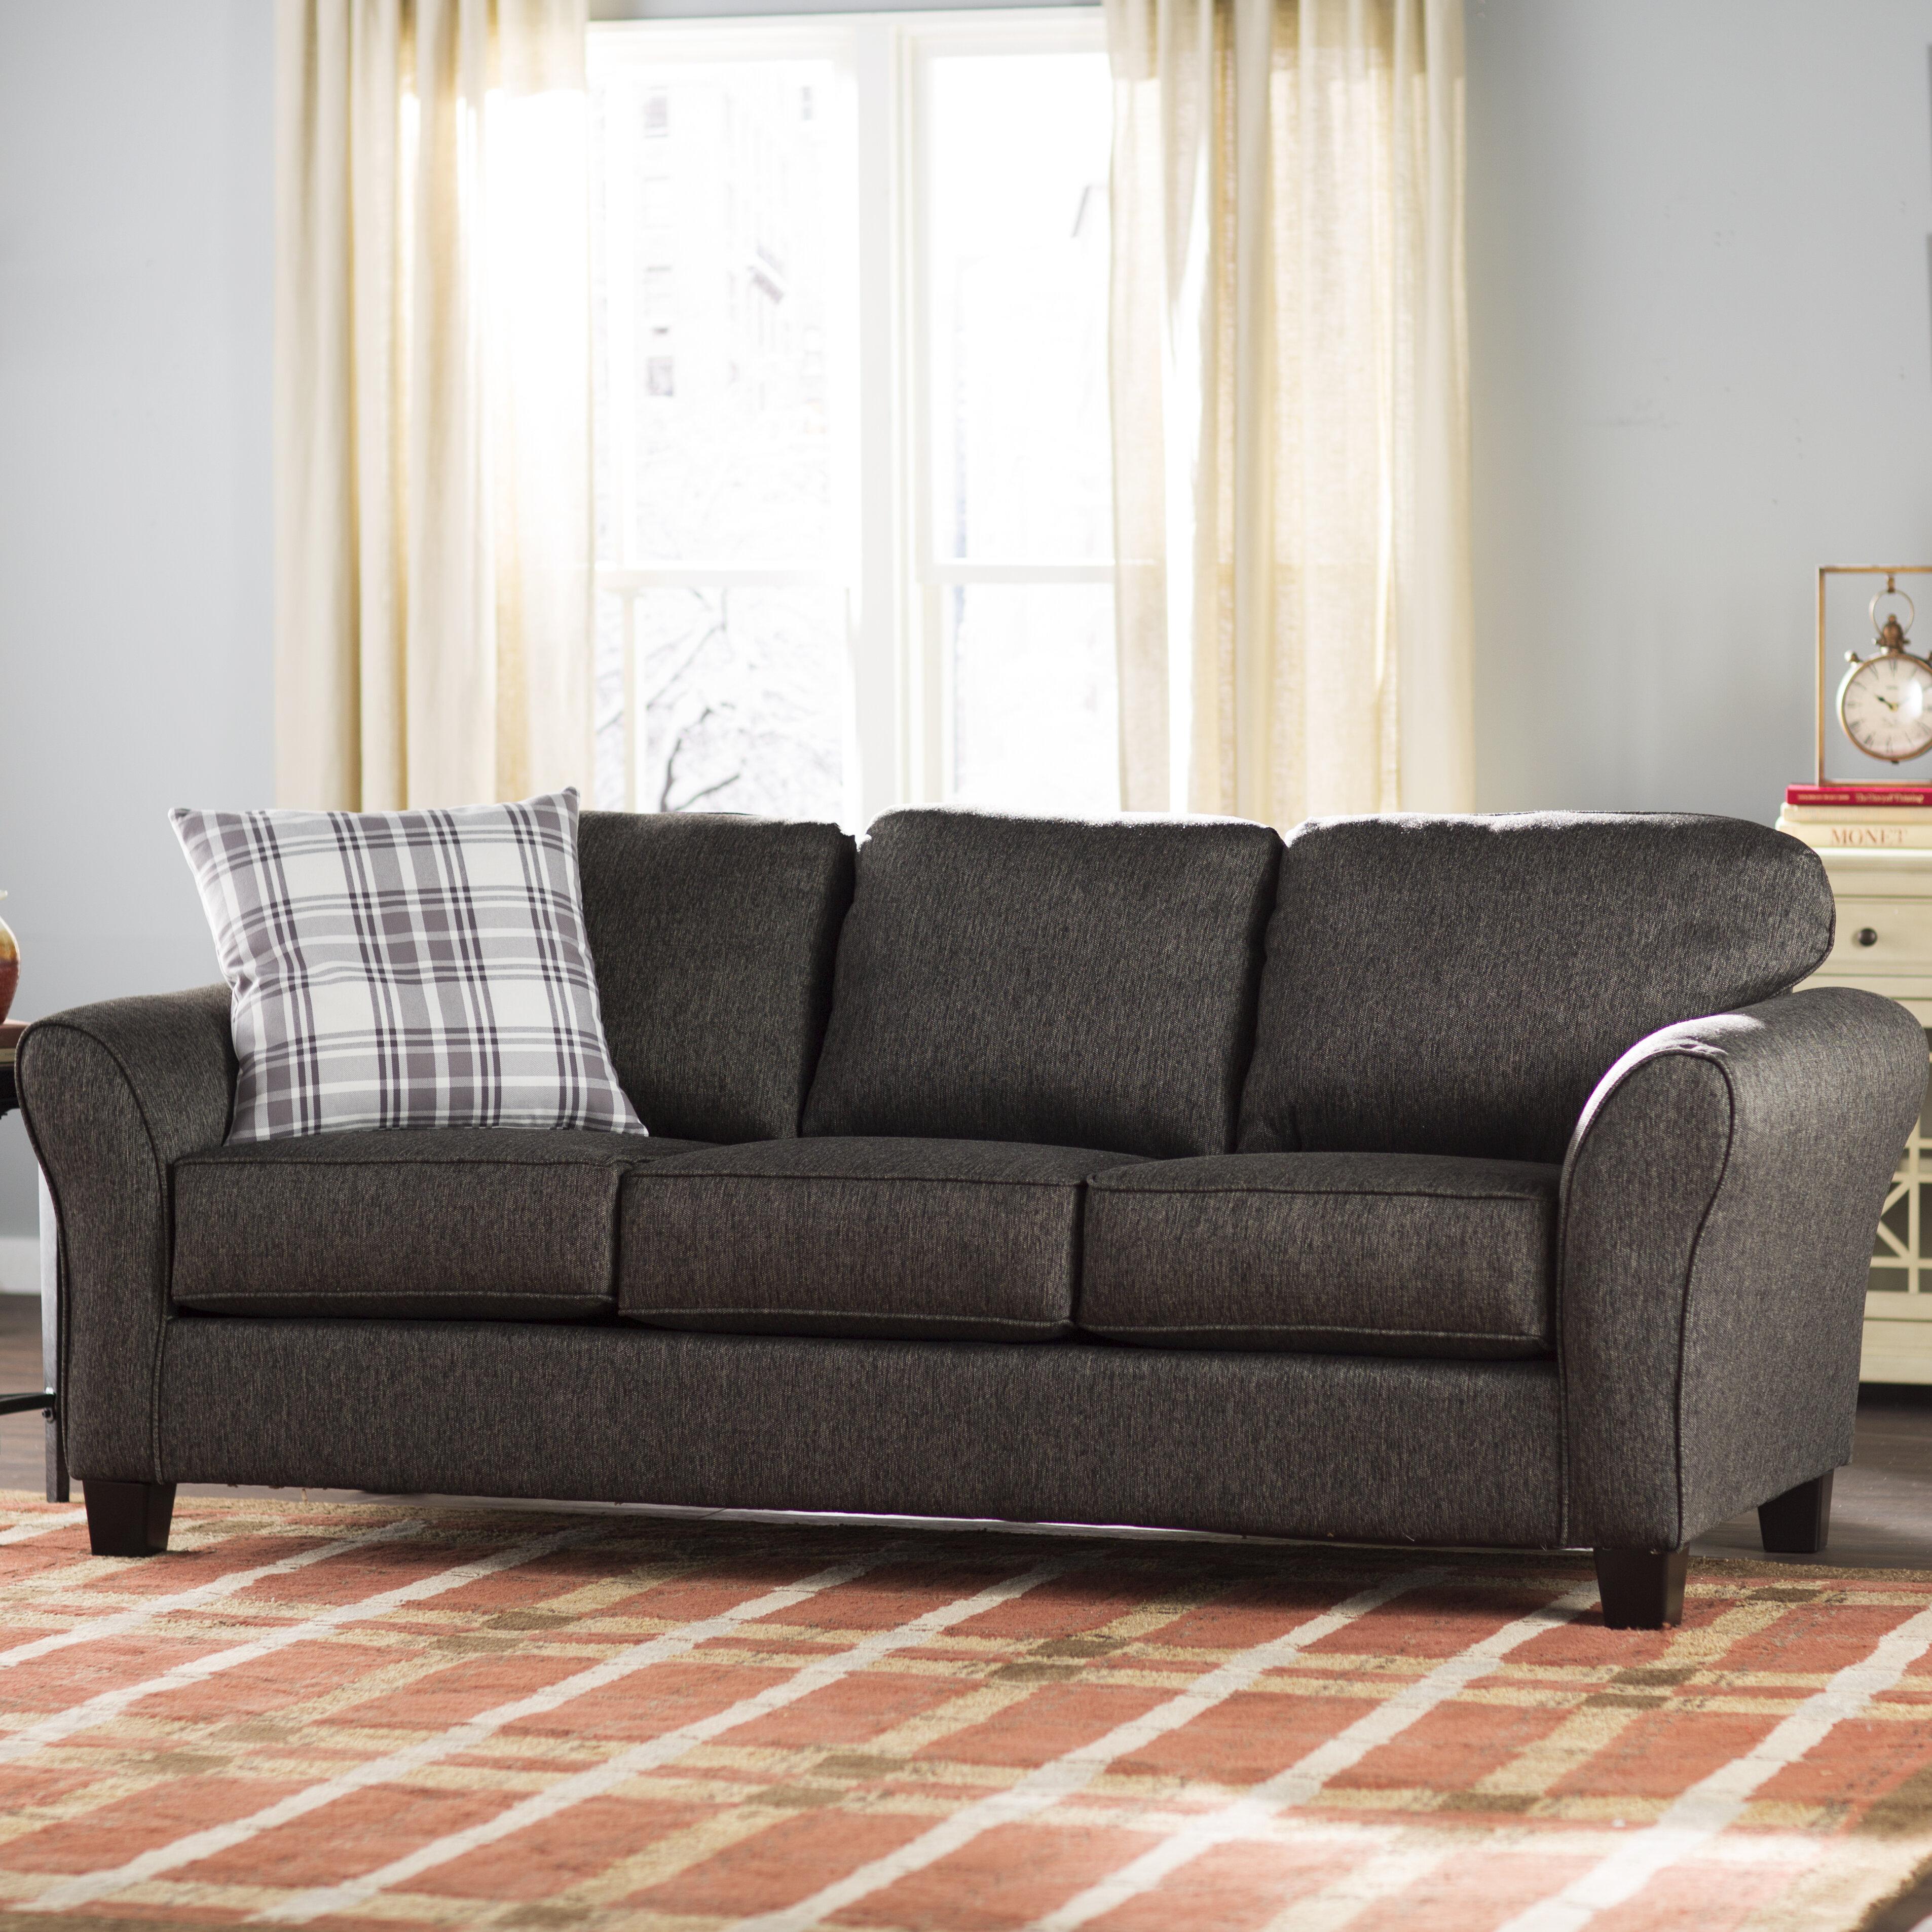 Serta Upholstery Westbrook Sofa & Reviews | Birch Lane